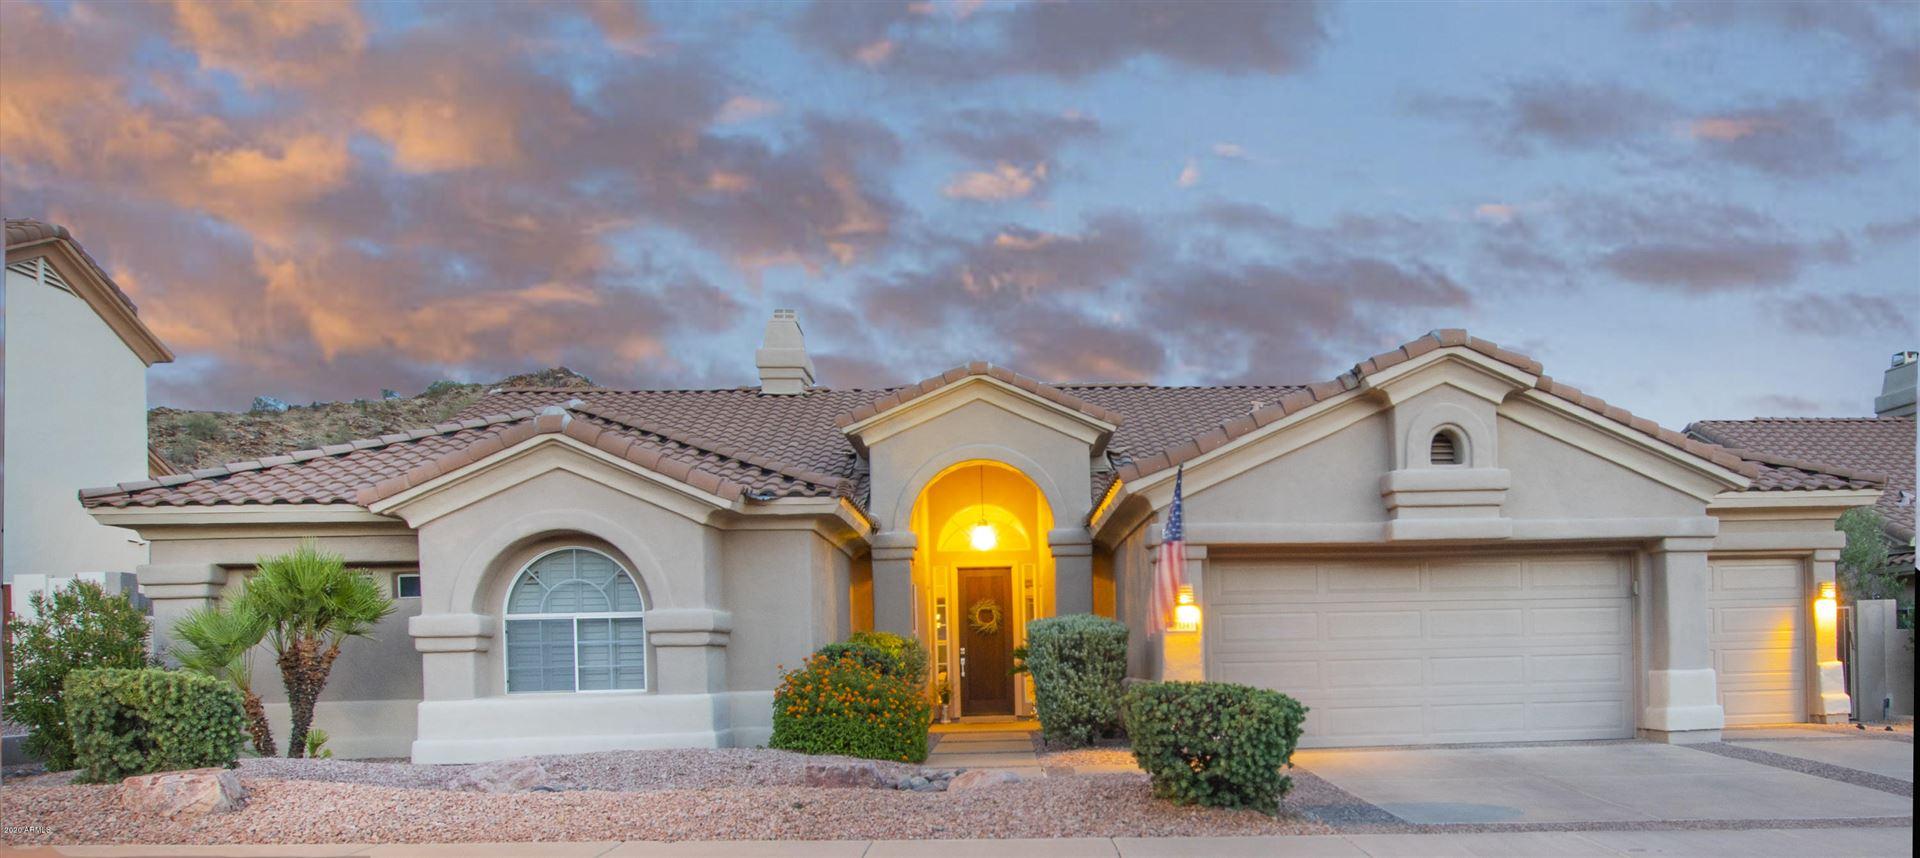 1343 E DESERT BROOM Way, Phoenix, AZ 85048 - MLS#: 6097182